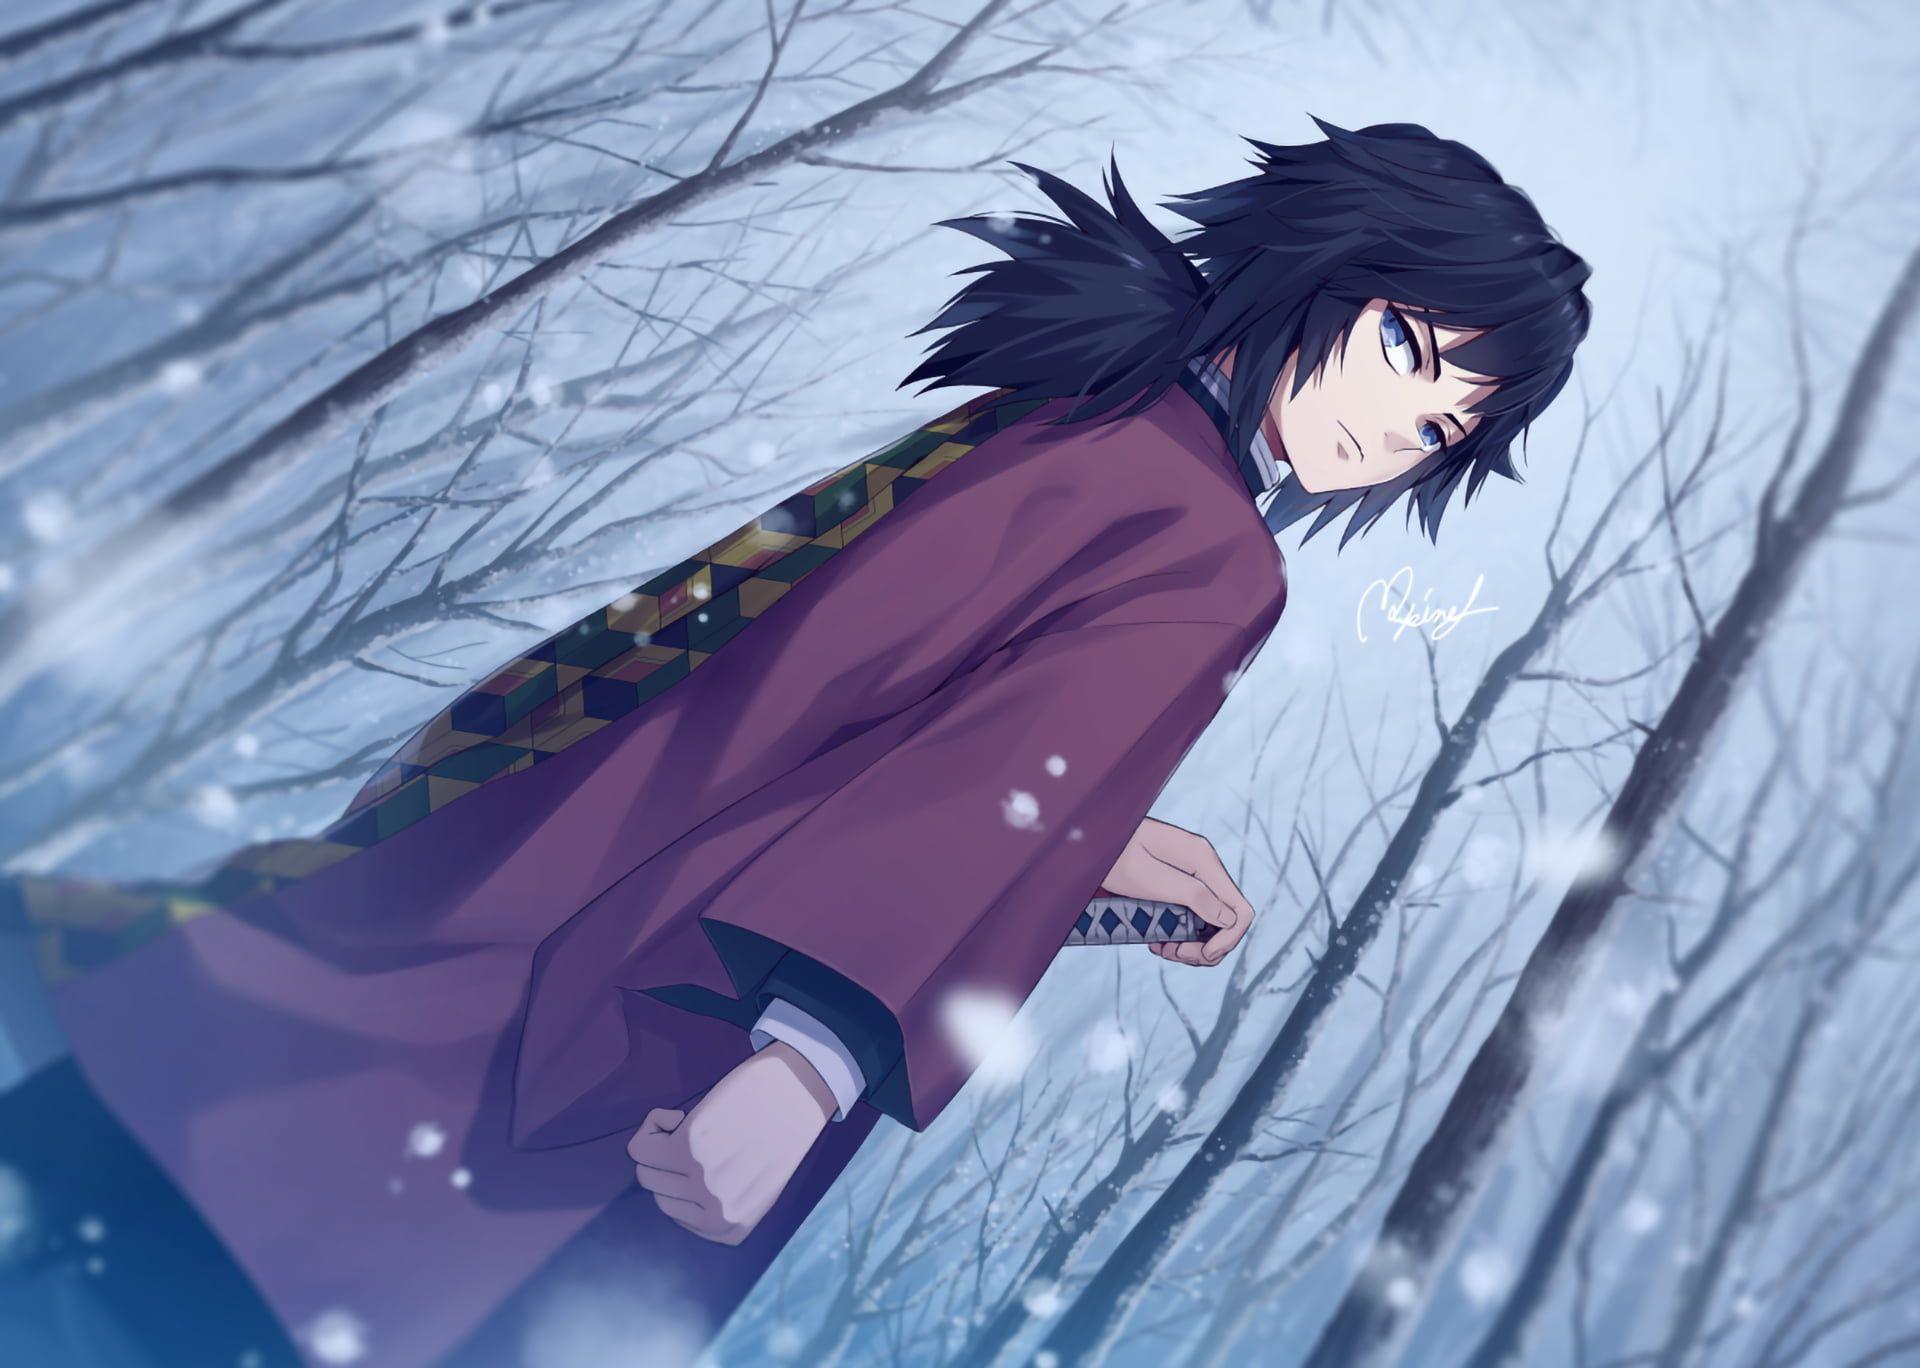 Anime Demon Slayer Kimetsu No Yaiba Giyuu Tomioka 1080p Wallpaper Hdwallpaper Desktop Slayer Anime Cool Anime Wallpapers Hd Anime Wallpapers